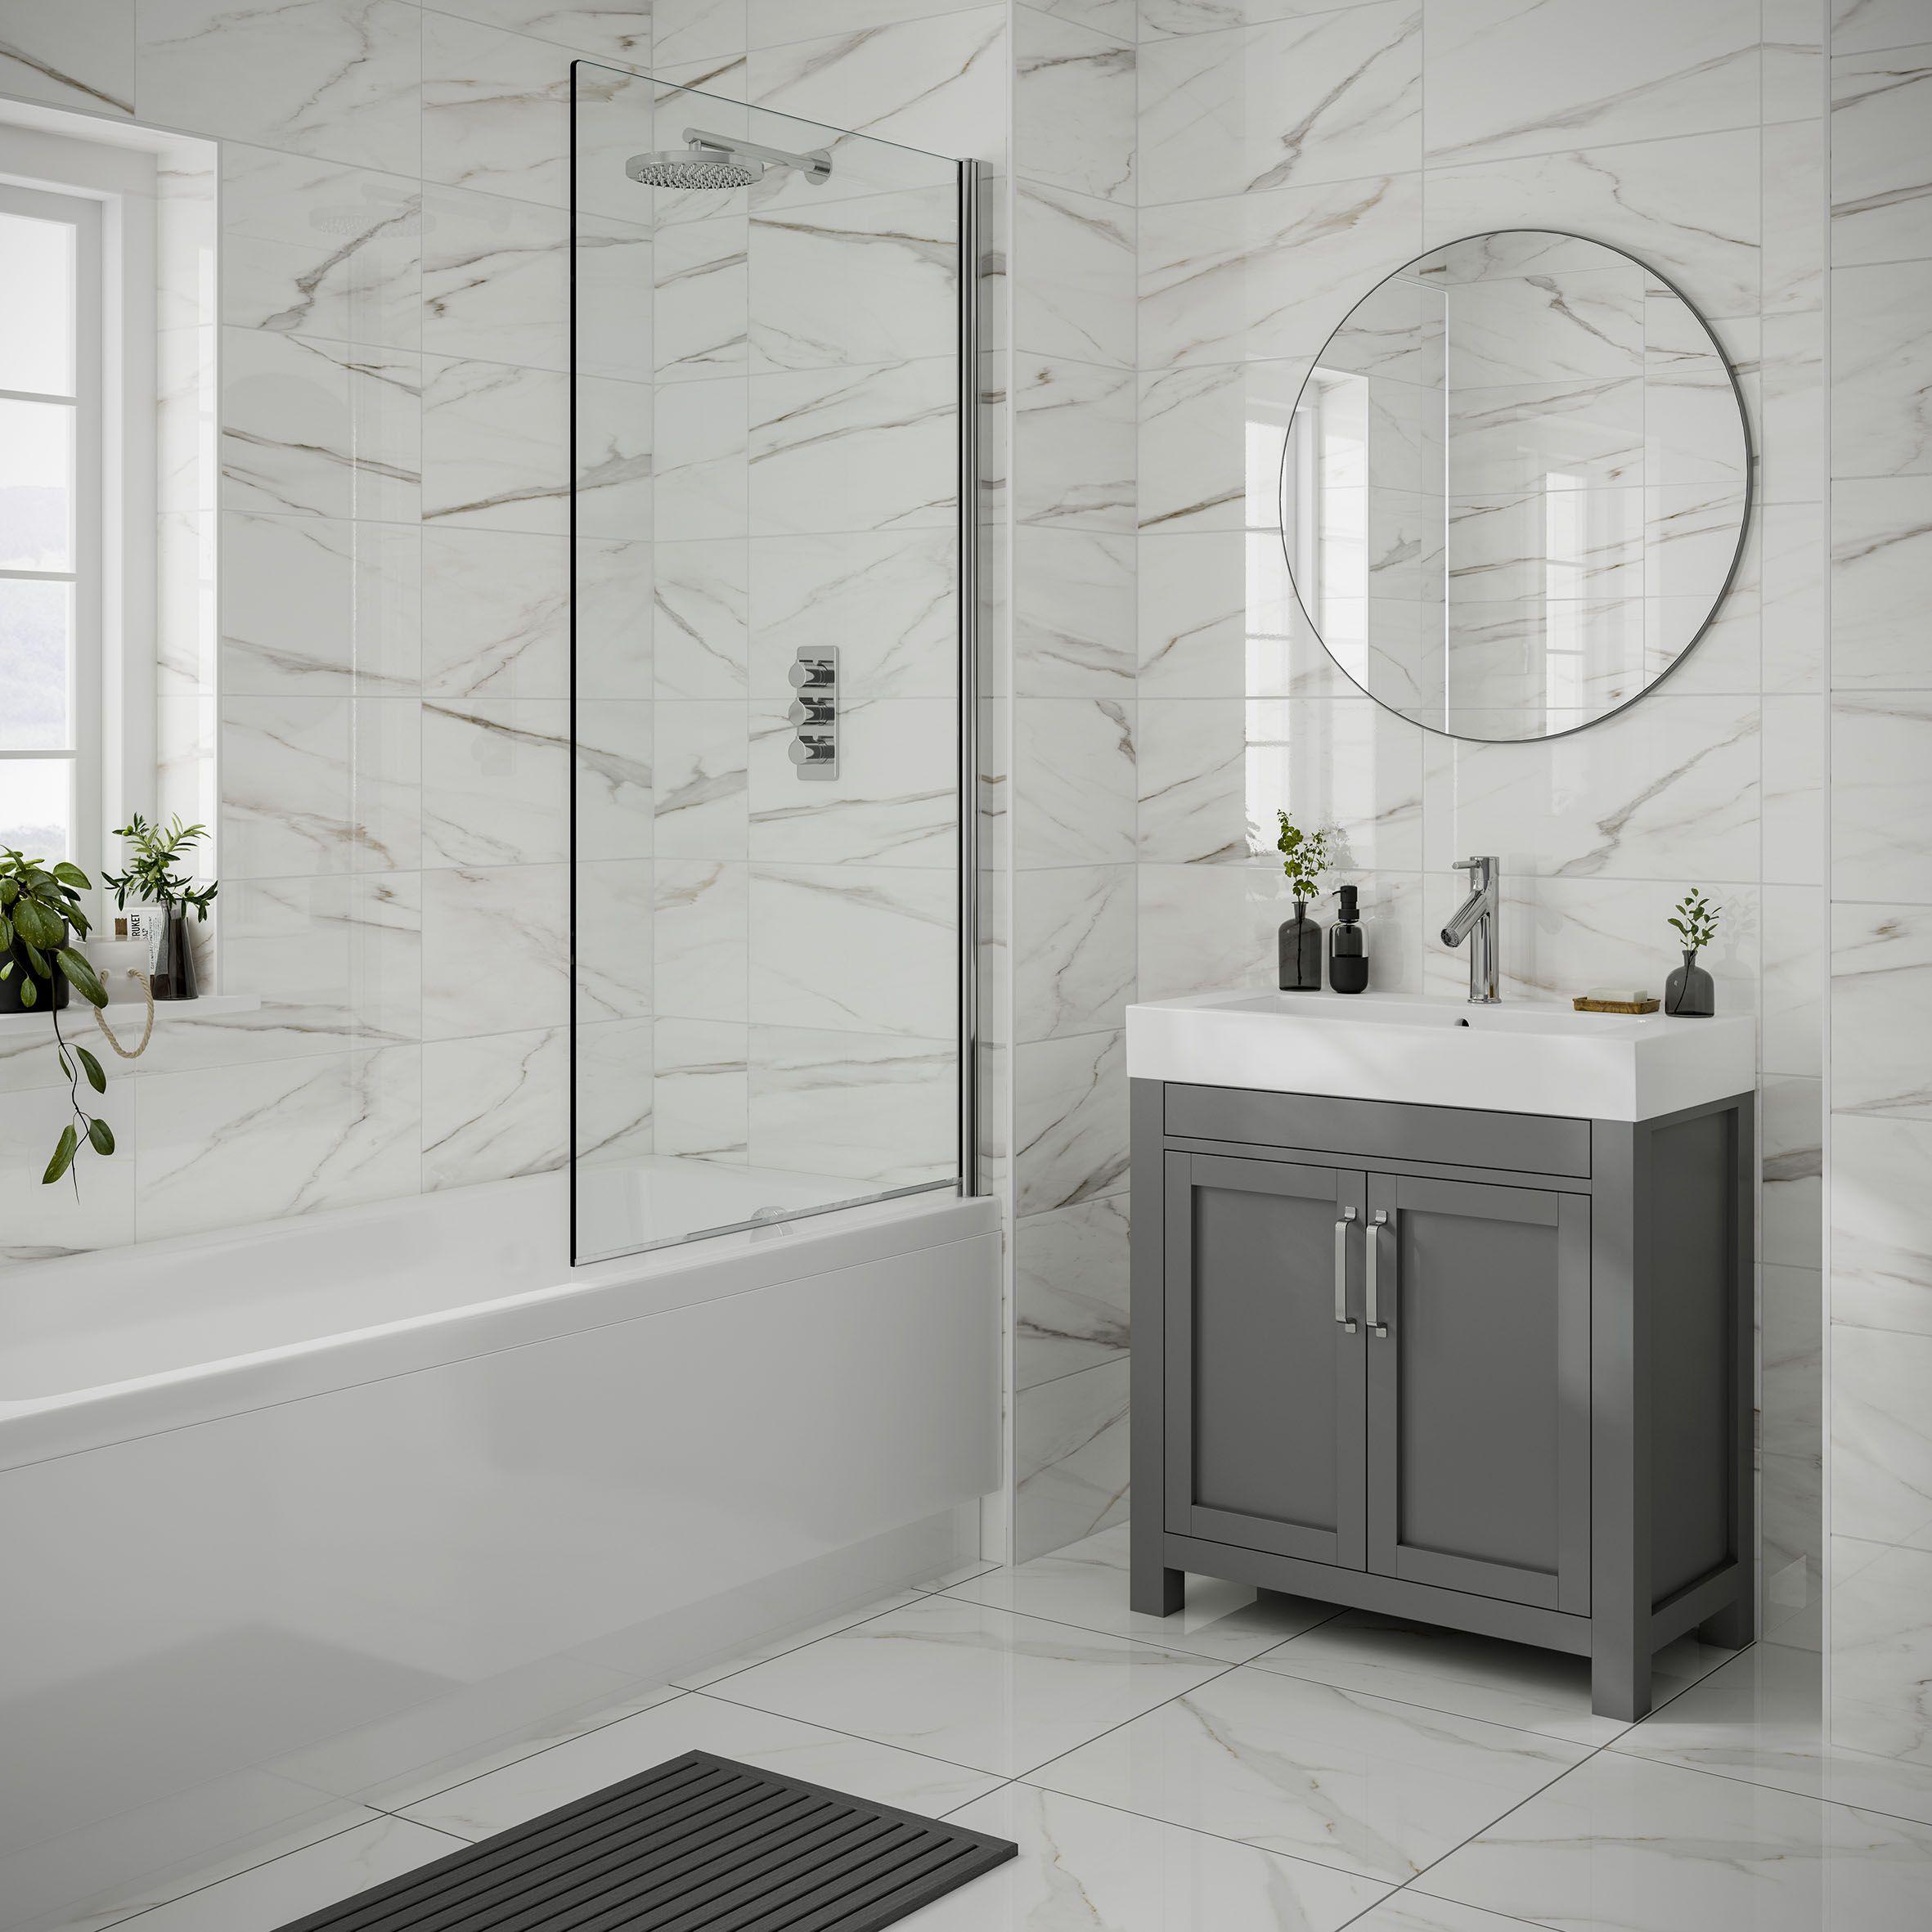 lulworth gloss bathroom wall tile